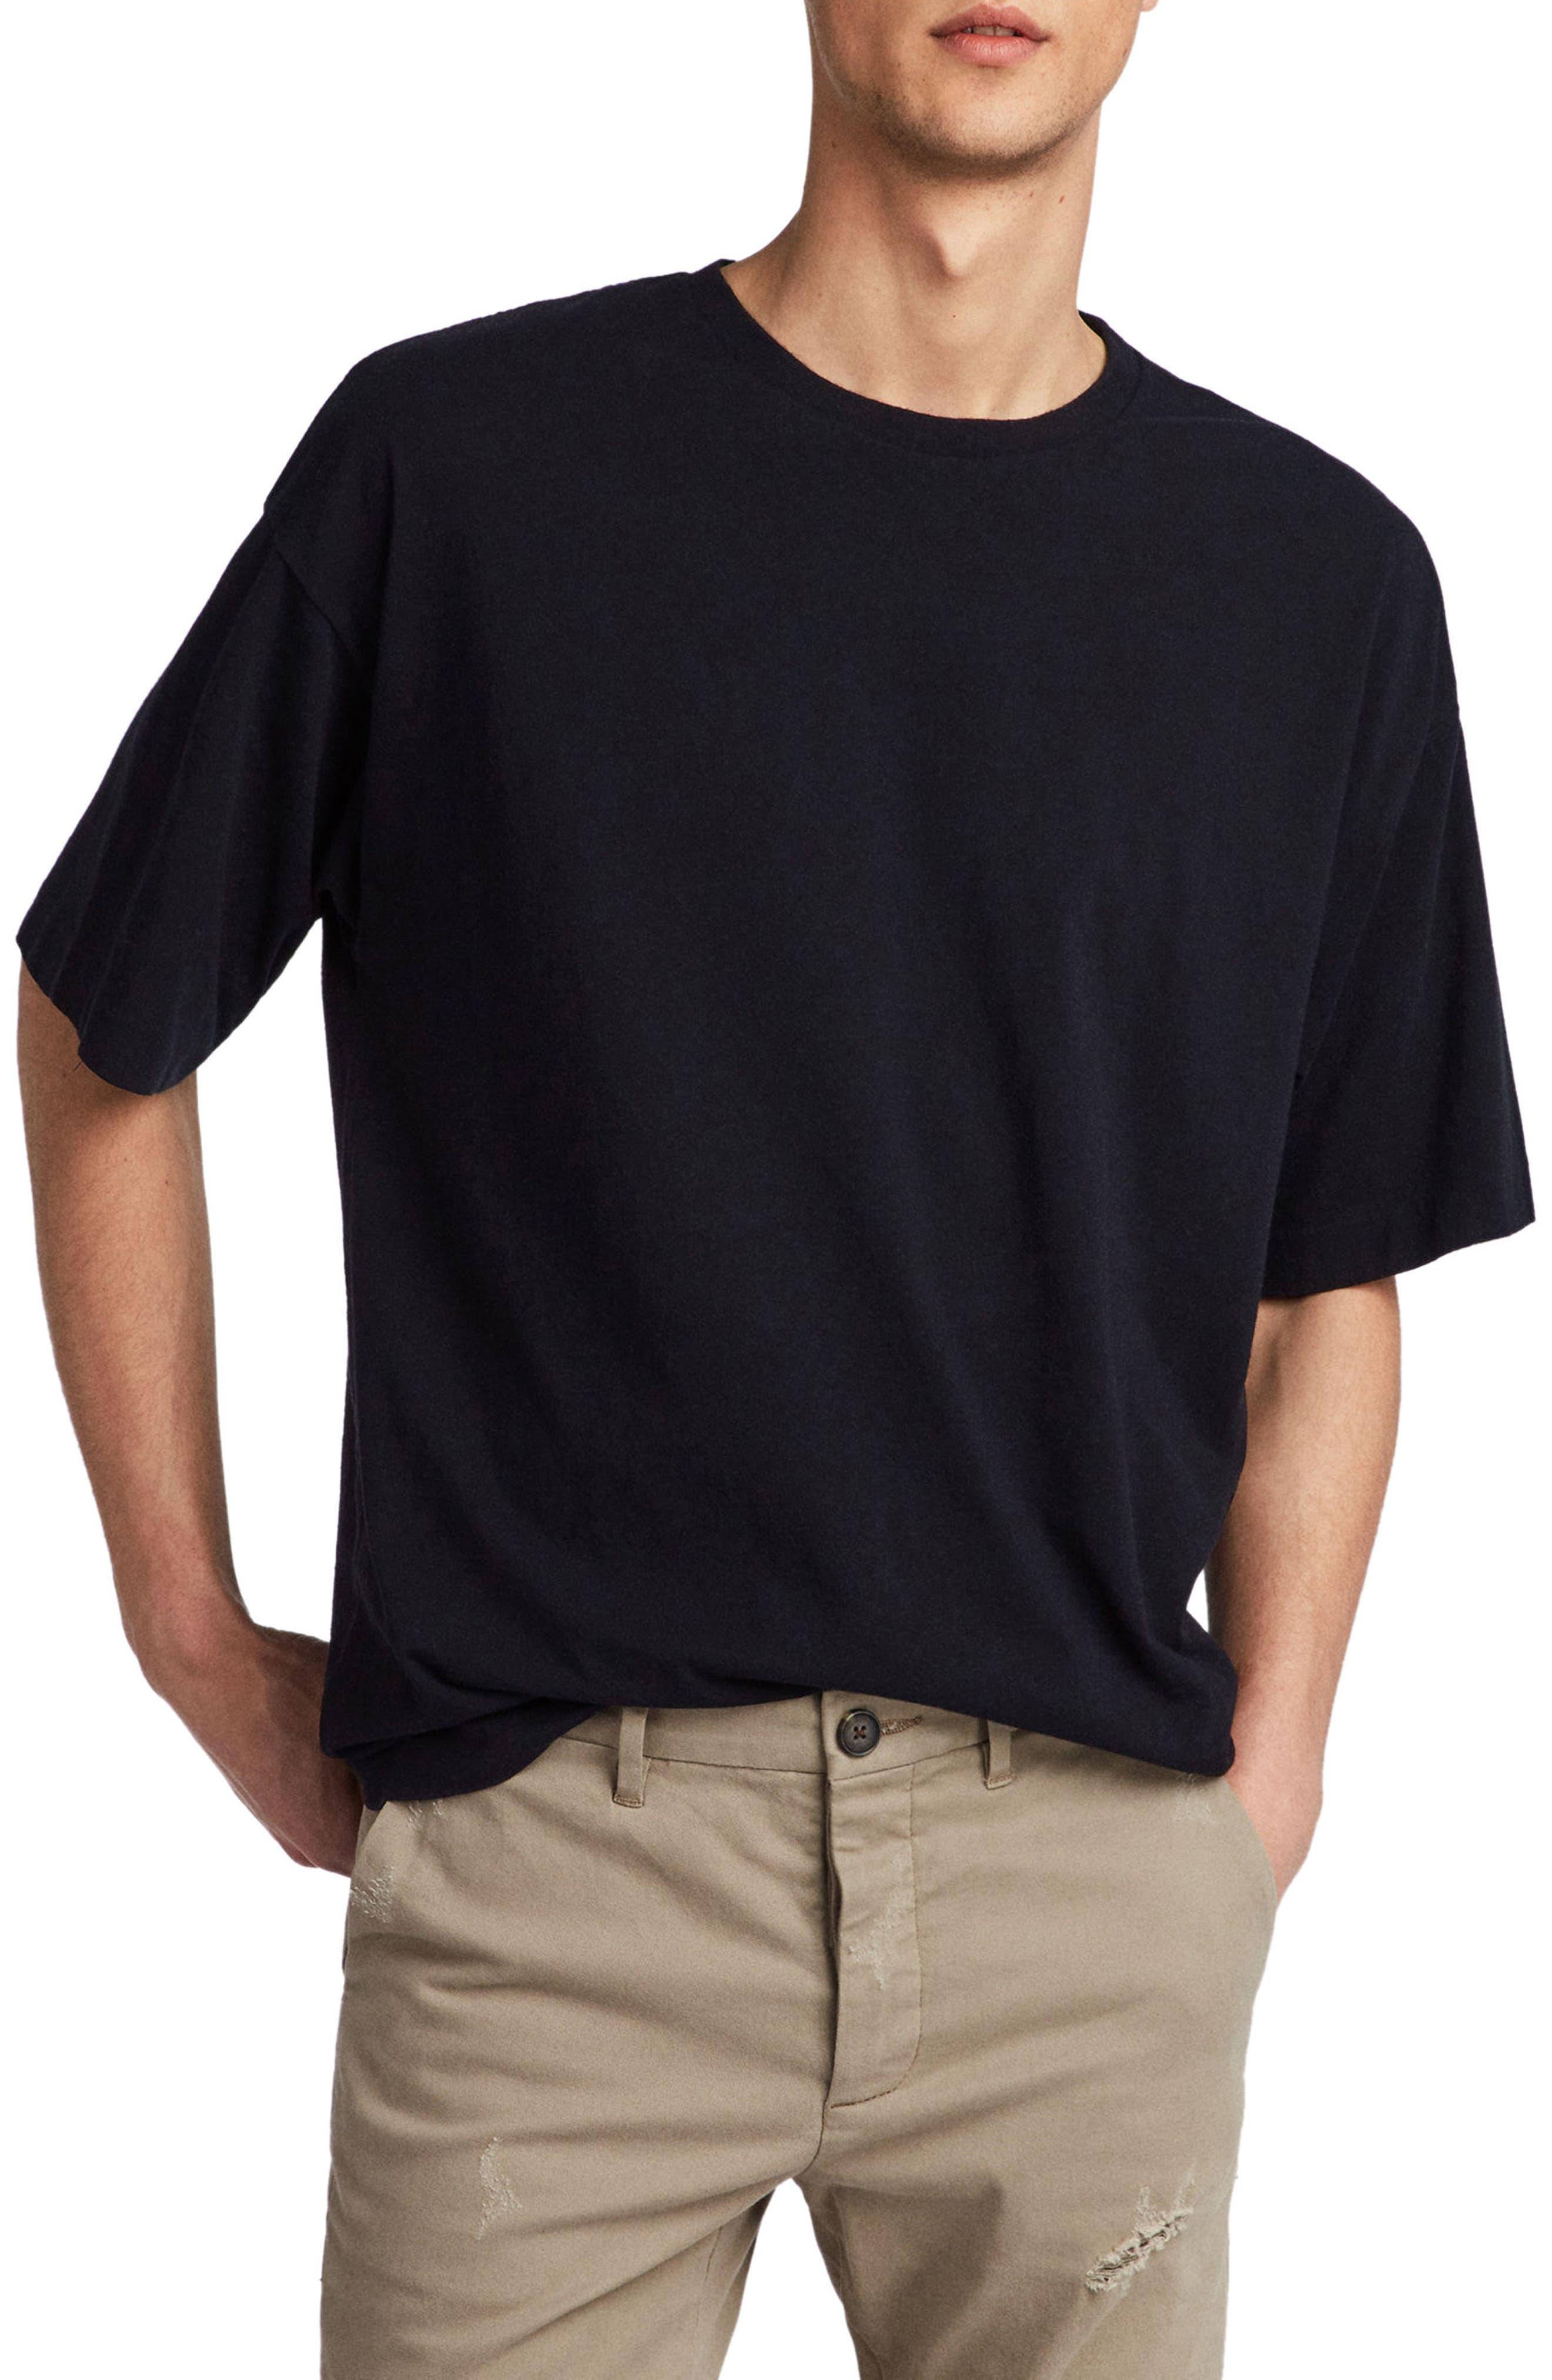 Atnom Crewneck T-Shirt,                             Main thumbnail 1, color,                             003